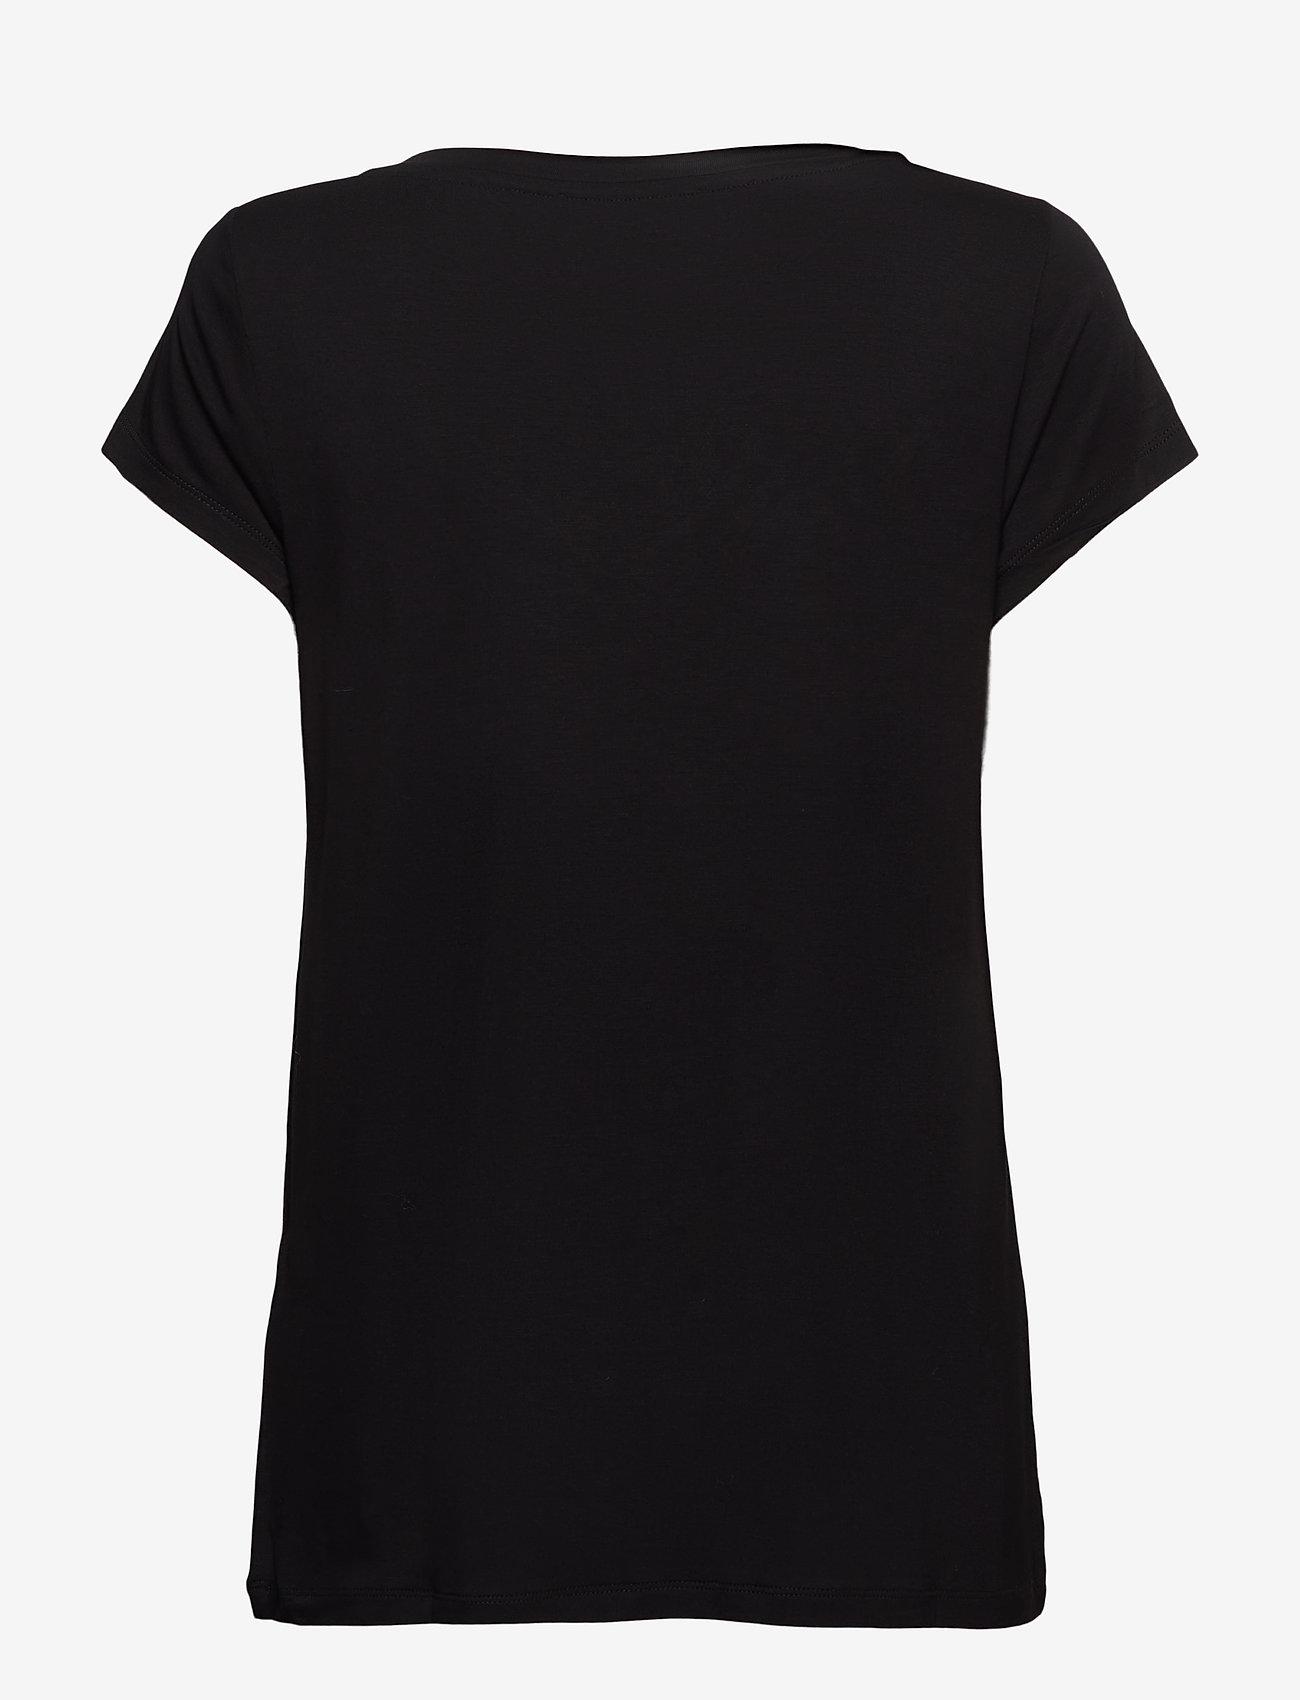 Rosemunde - T-shirt ss - t-shirts - black - 1